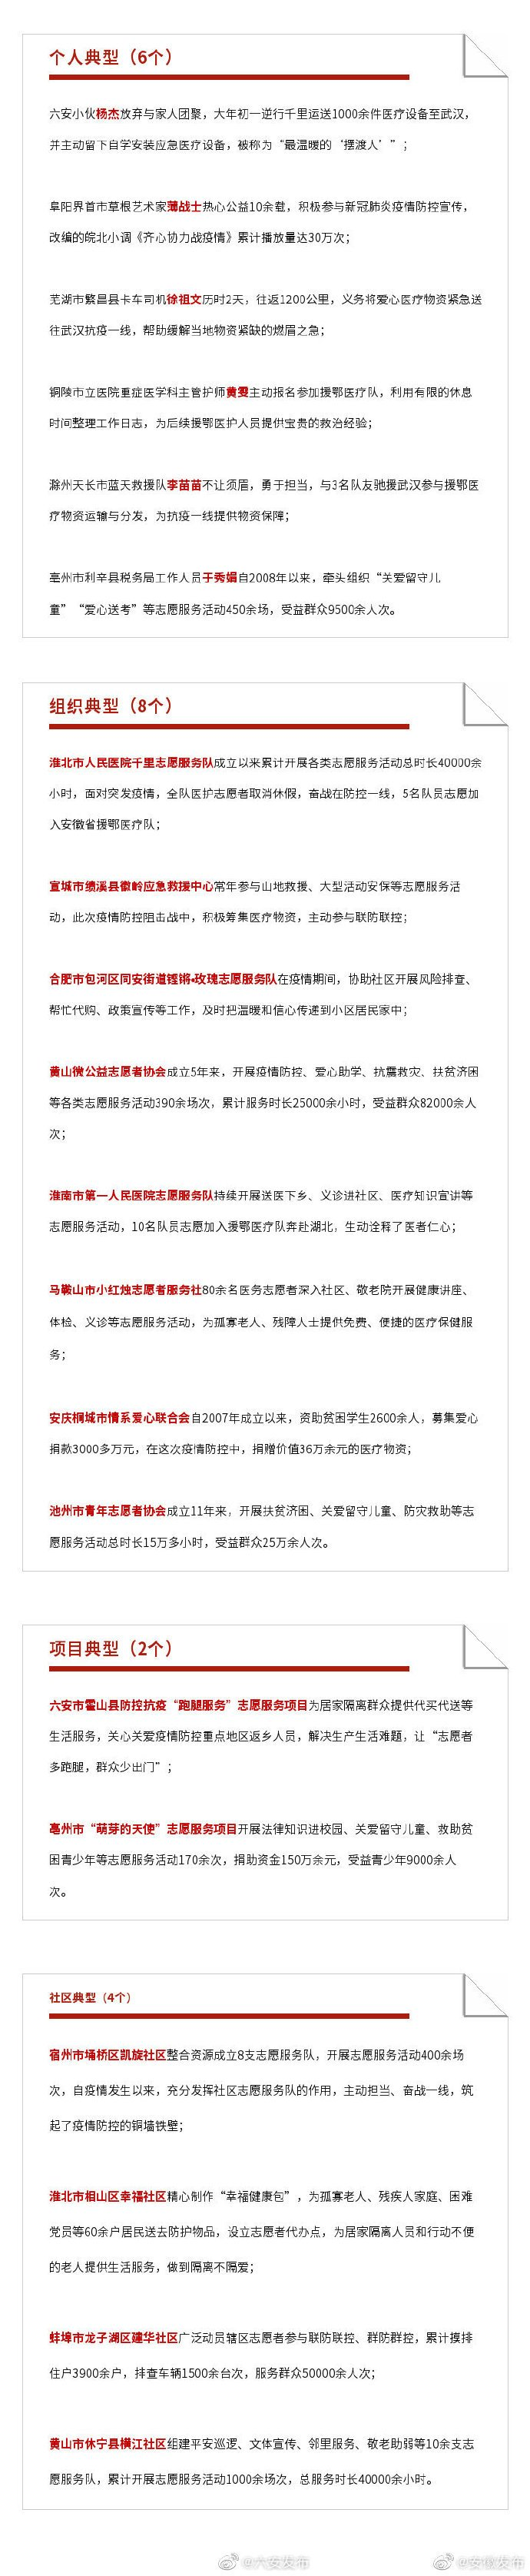 http://www.ahxinwen.com.cn/anhuifangchan/129845.html